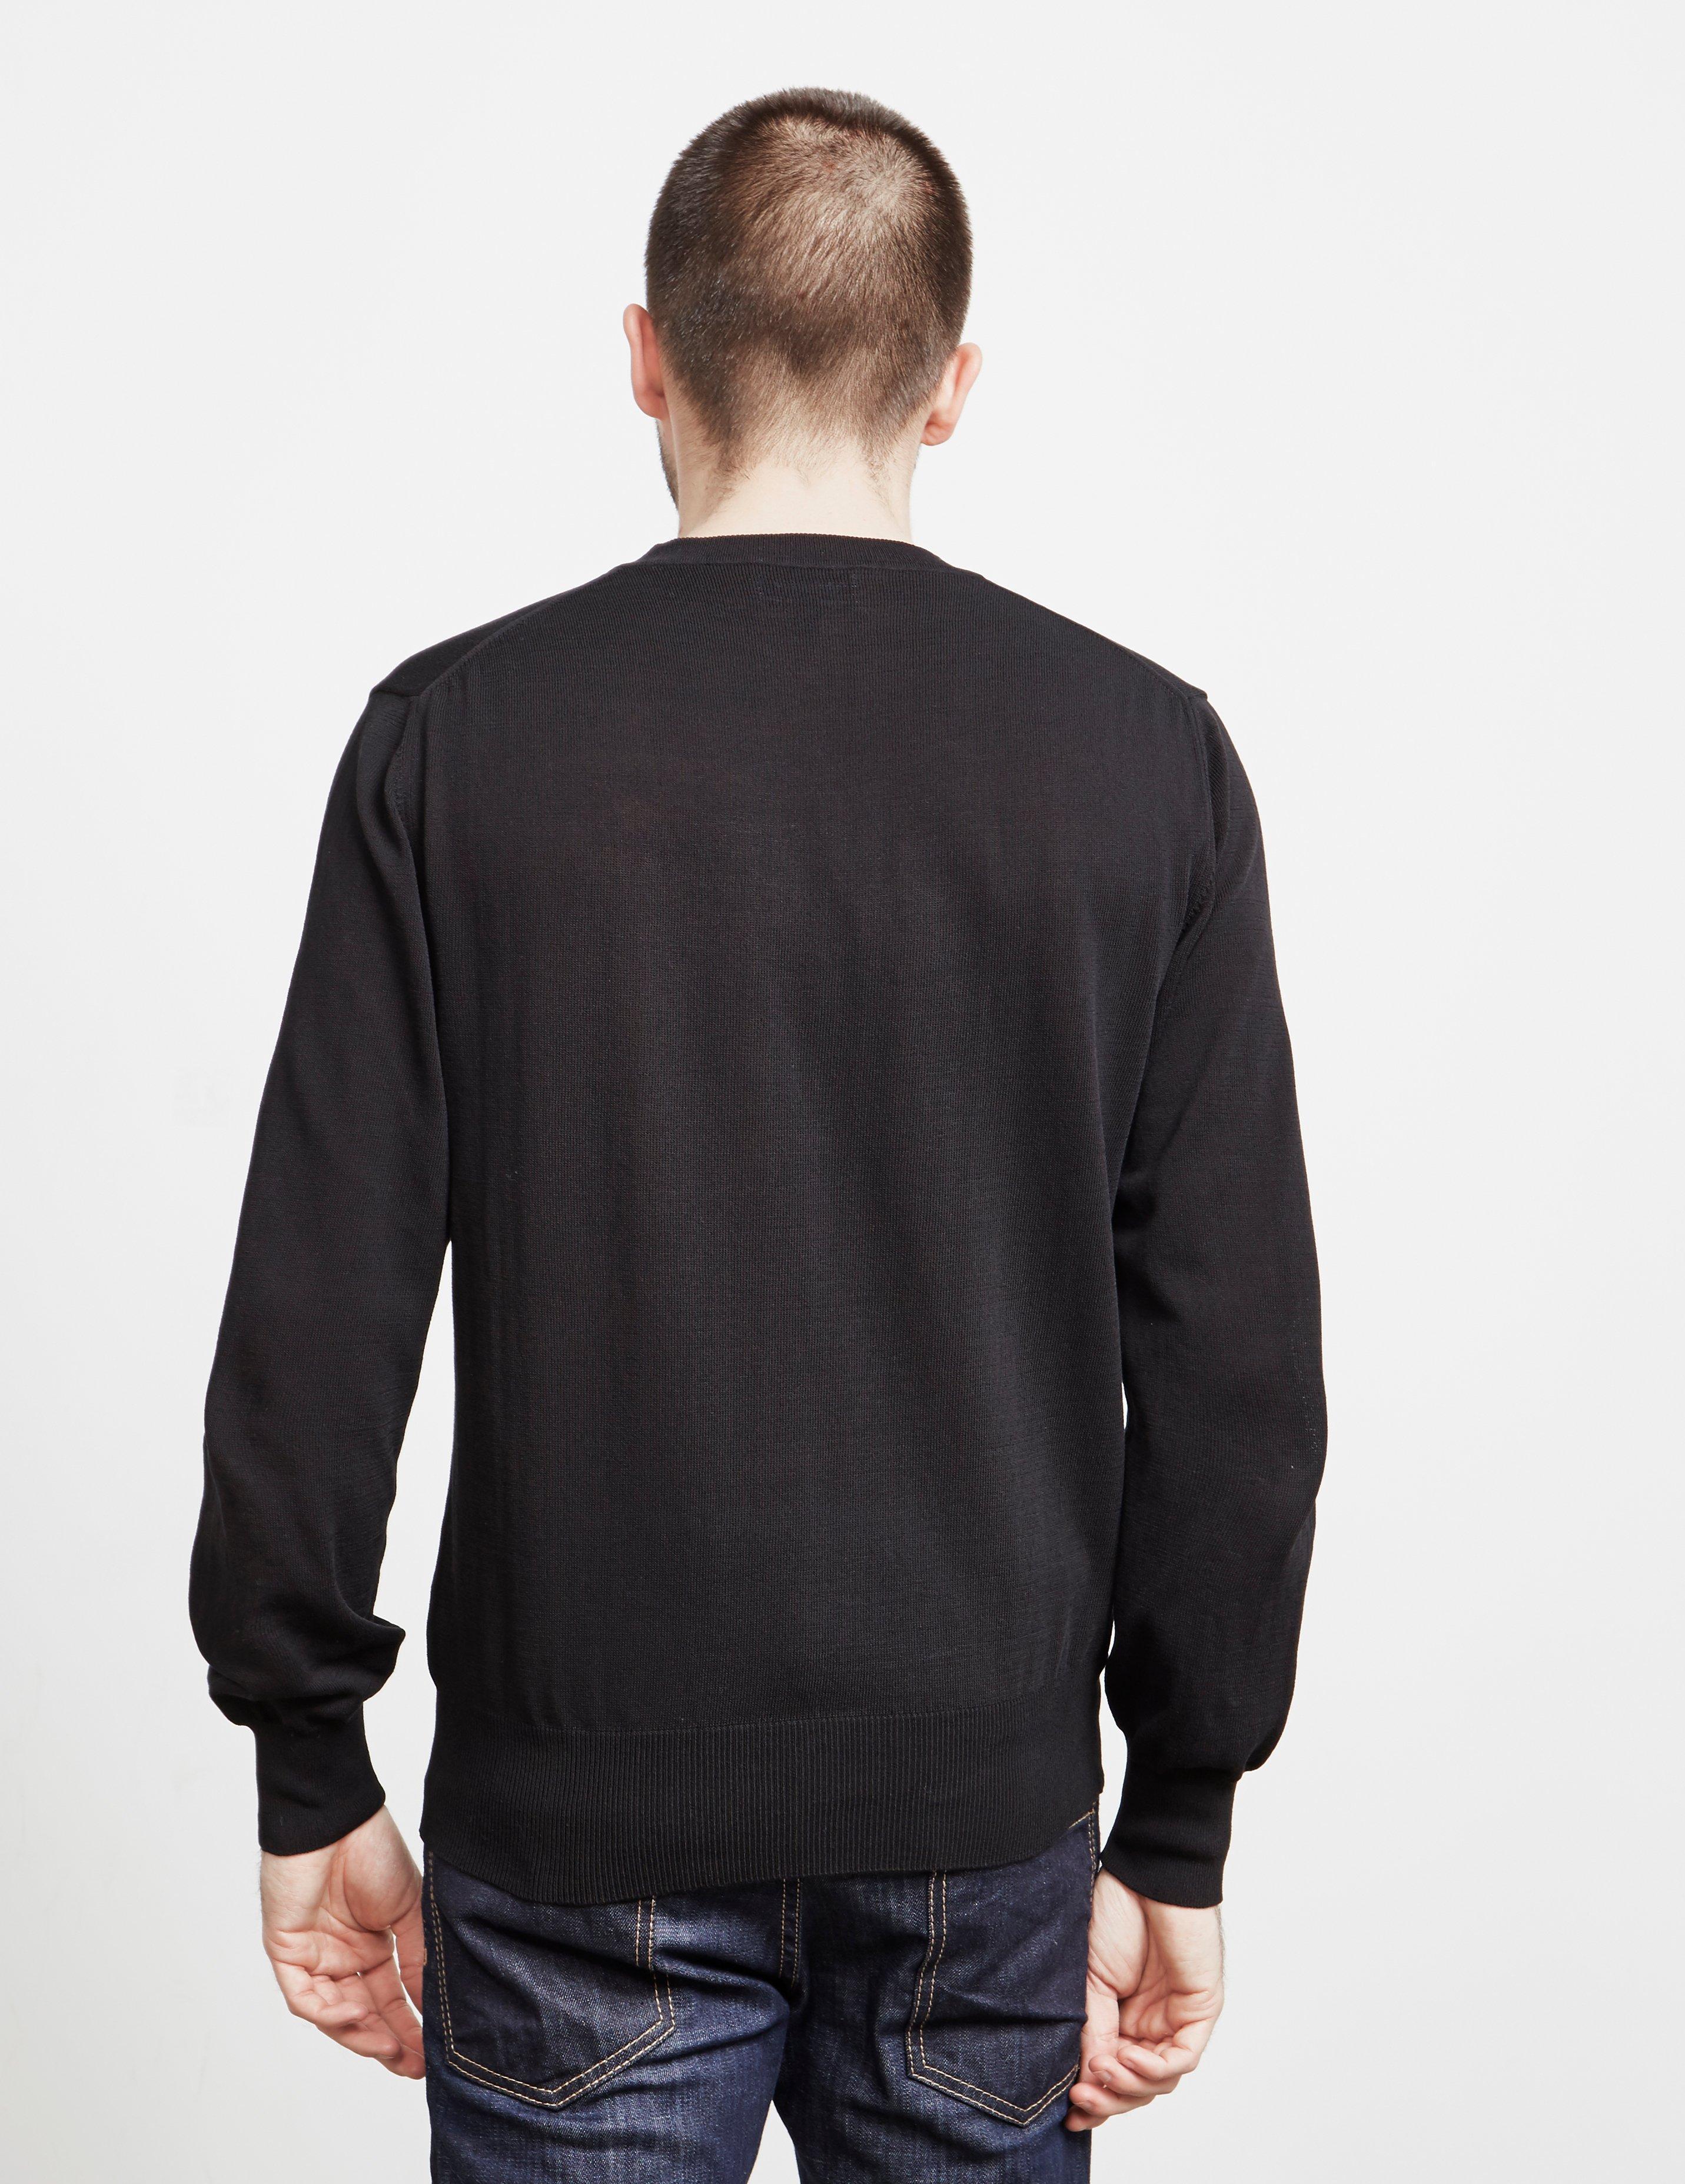 6093940934f86 Vivienne Westwood - Mens Orb Knit Jumper Black for Men - Lyst. View  fullscreen